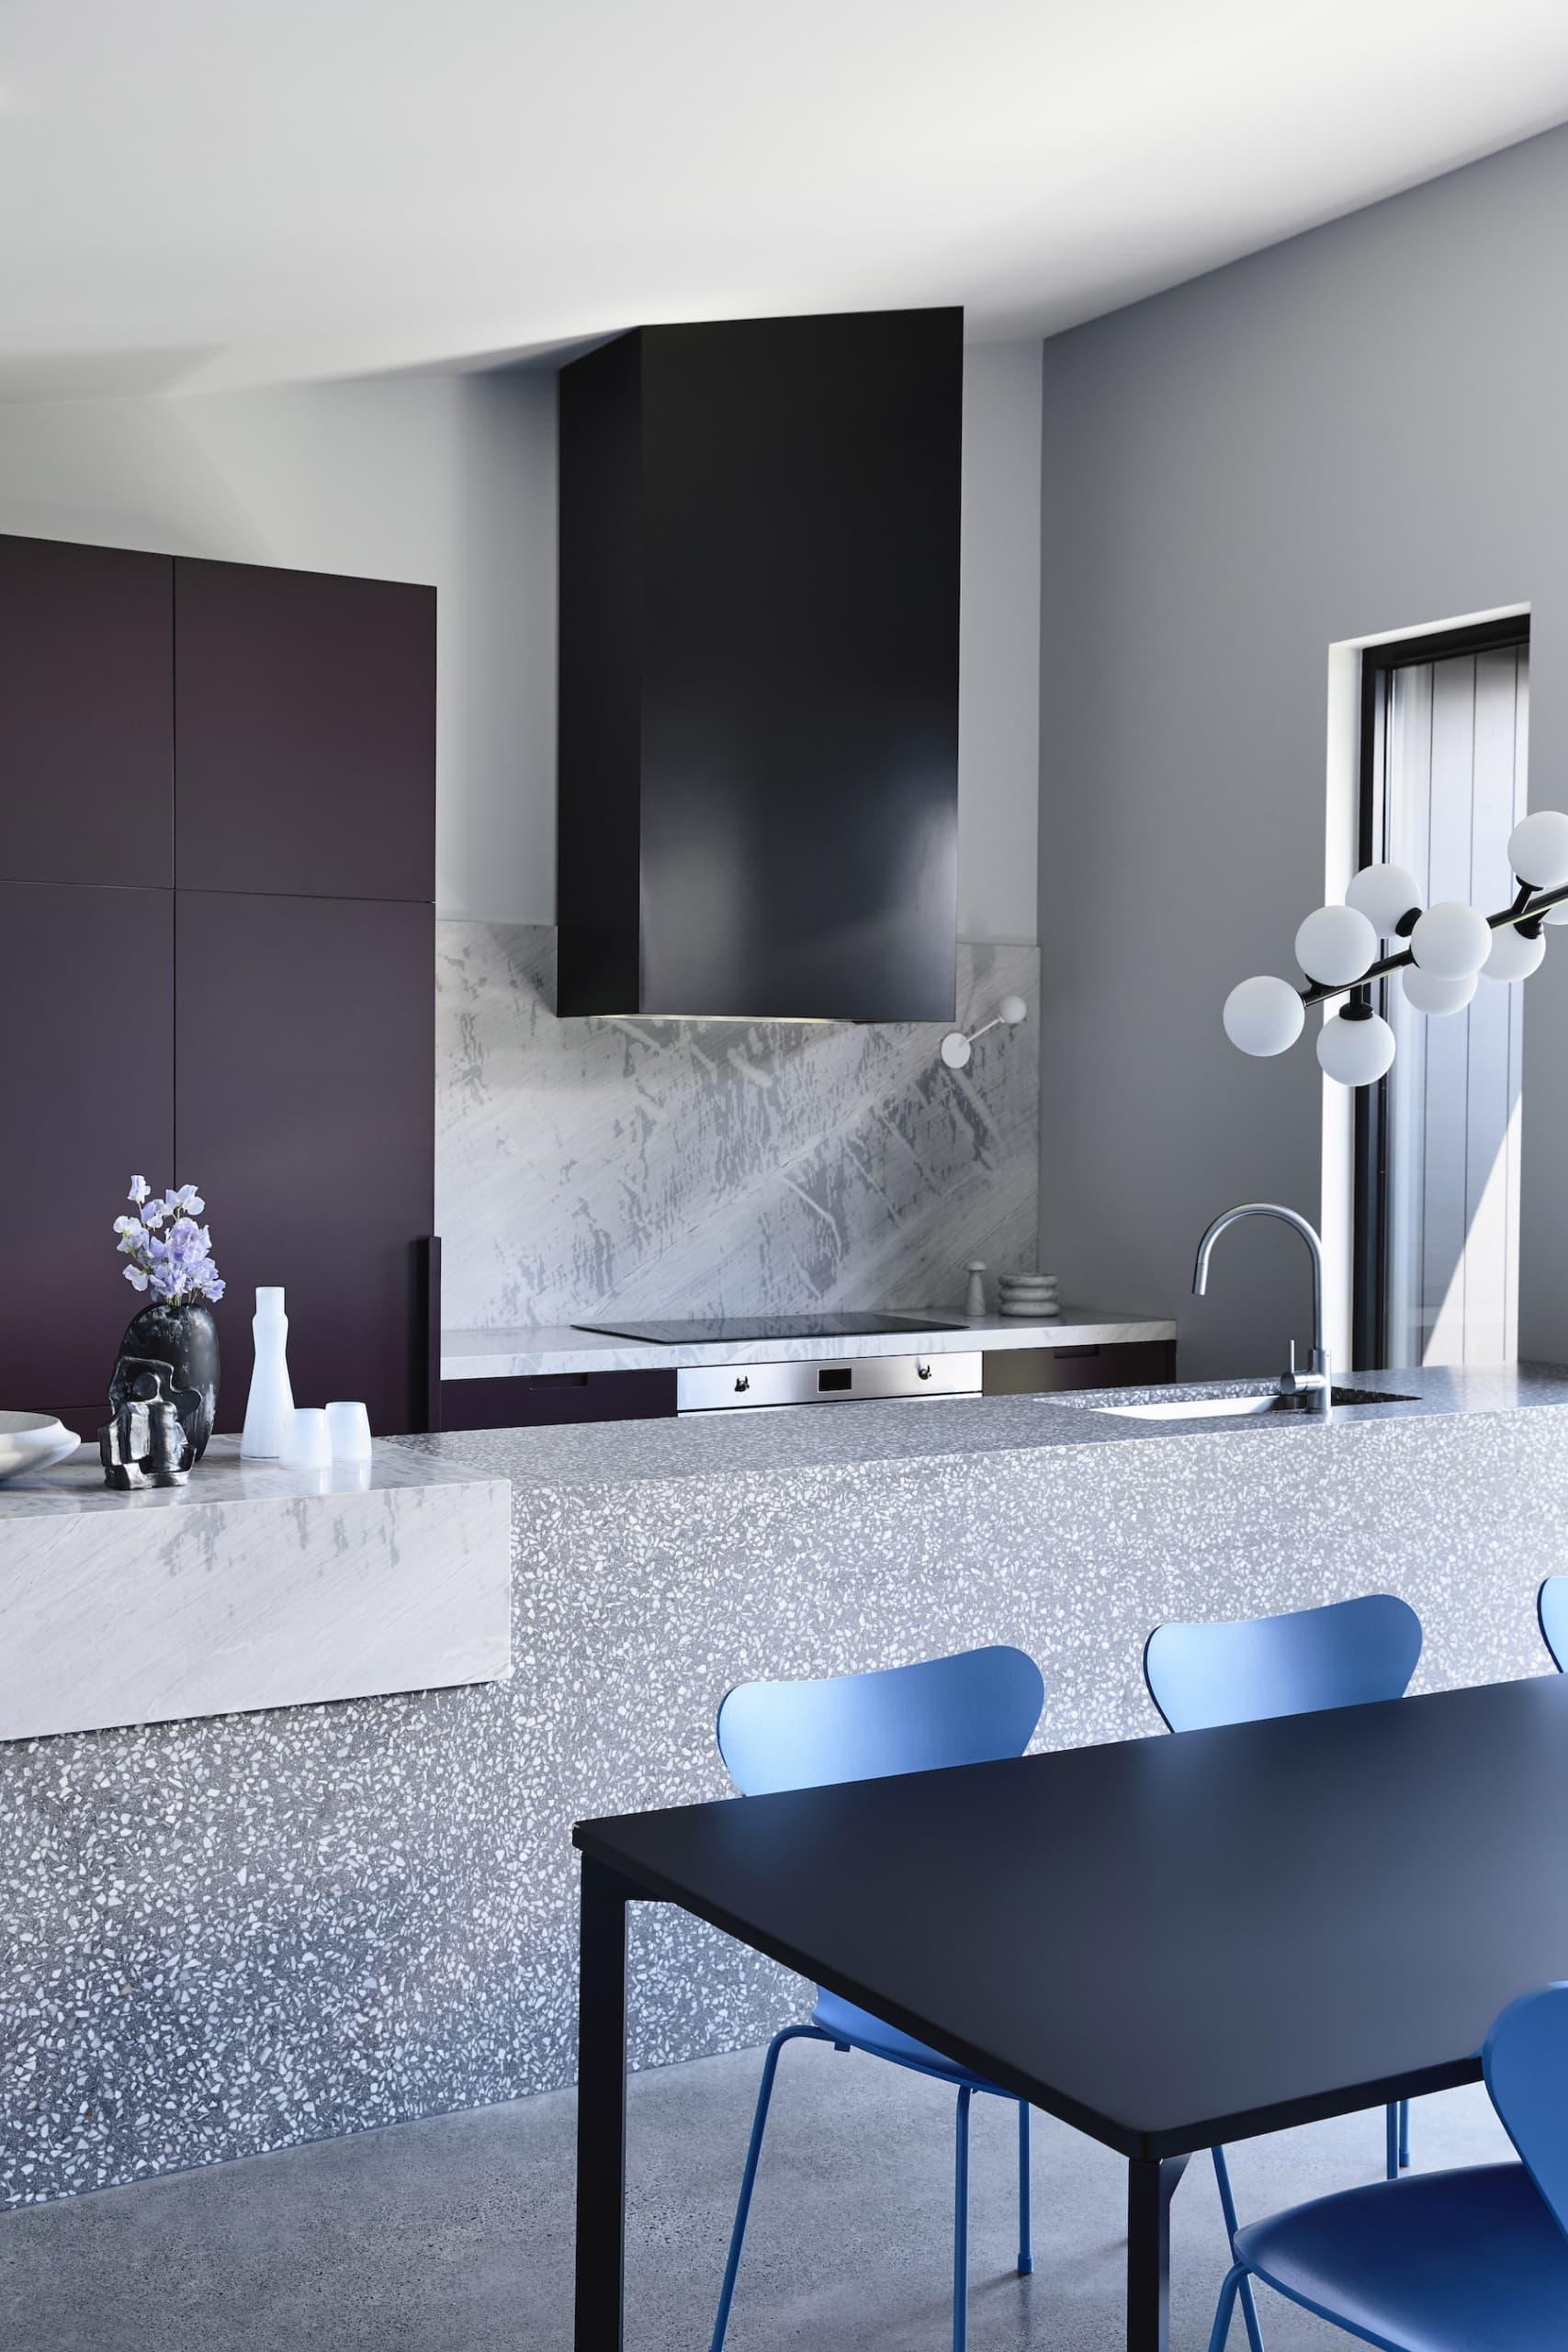 white terrazzo kitchen with black rangehood and purple cabinets